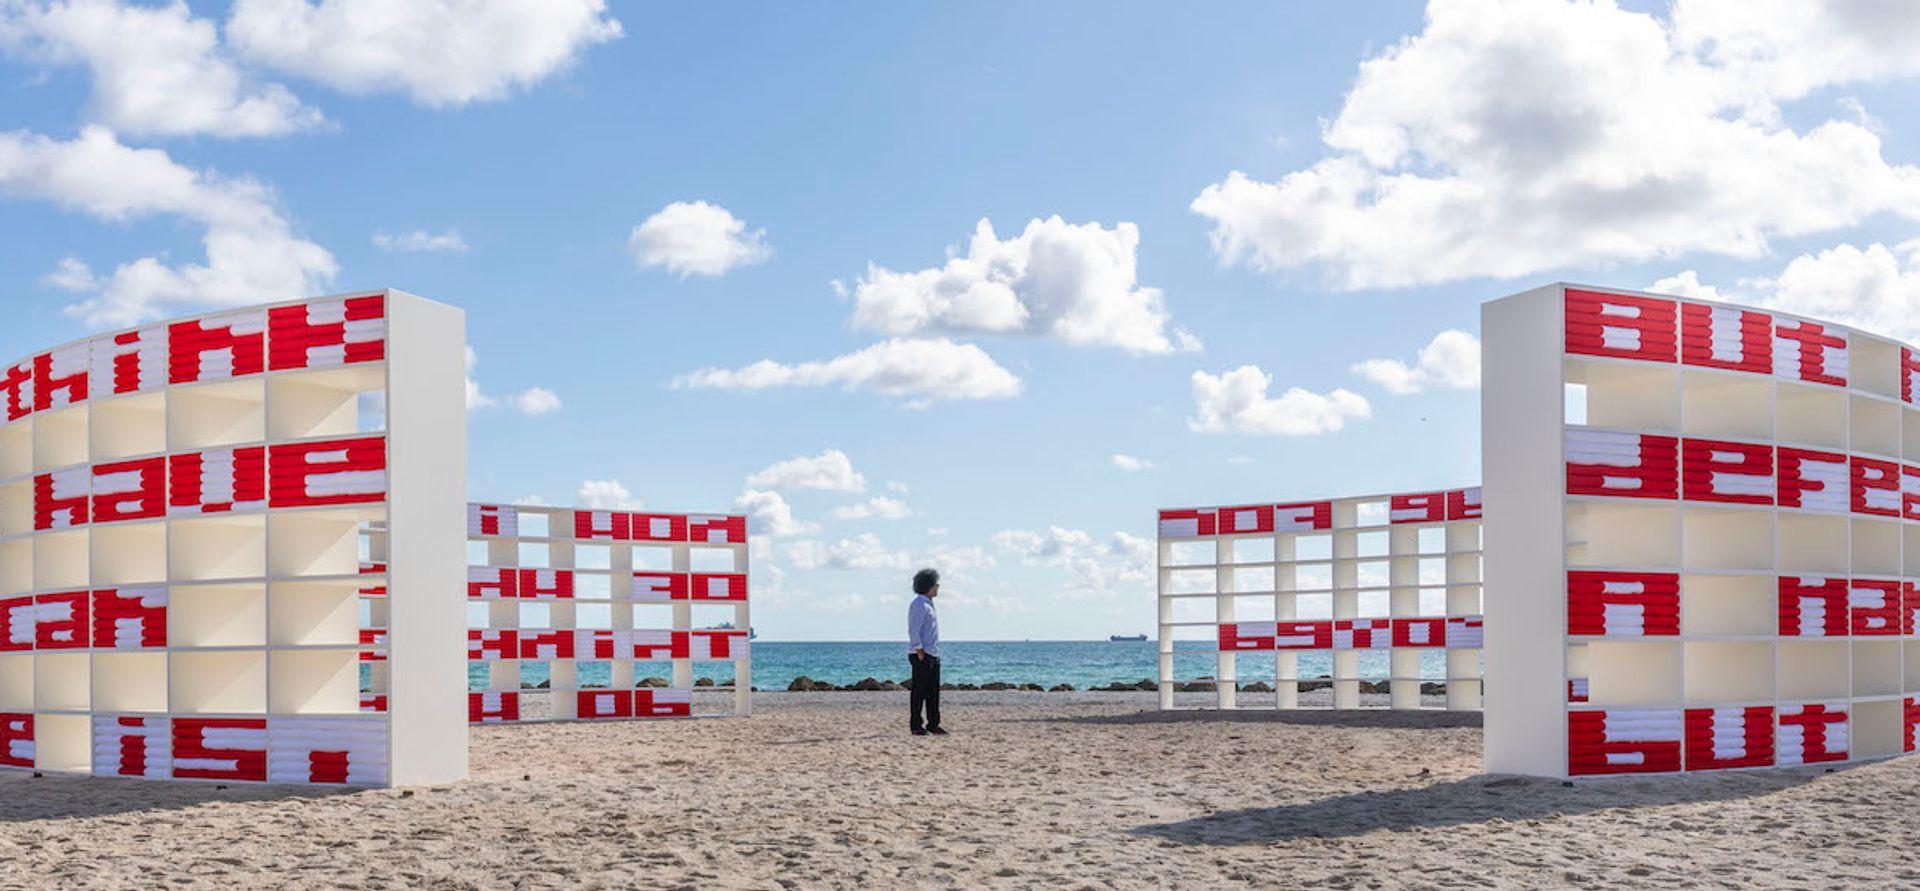 Alexandre Arrechea, Dreaming with Lions (2020) Oriol Tarridas for Faena Art